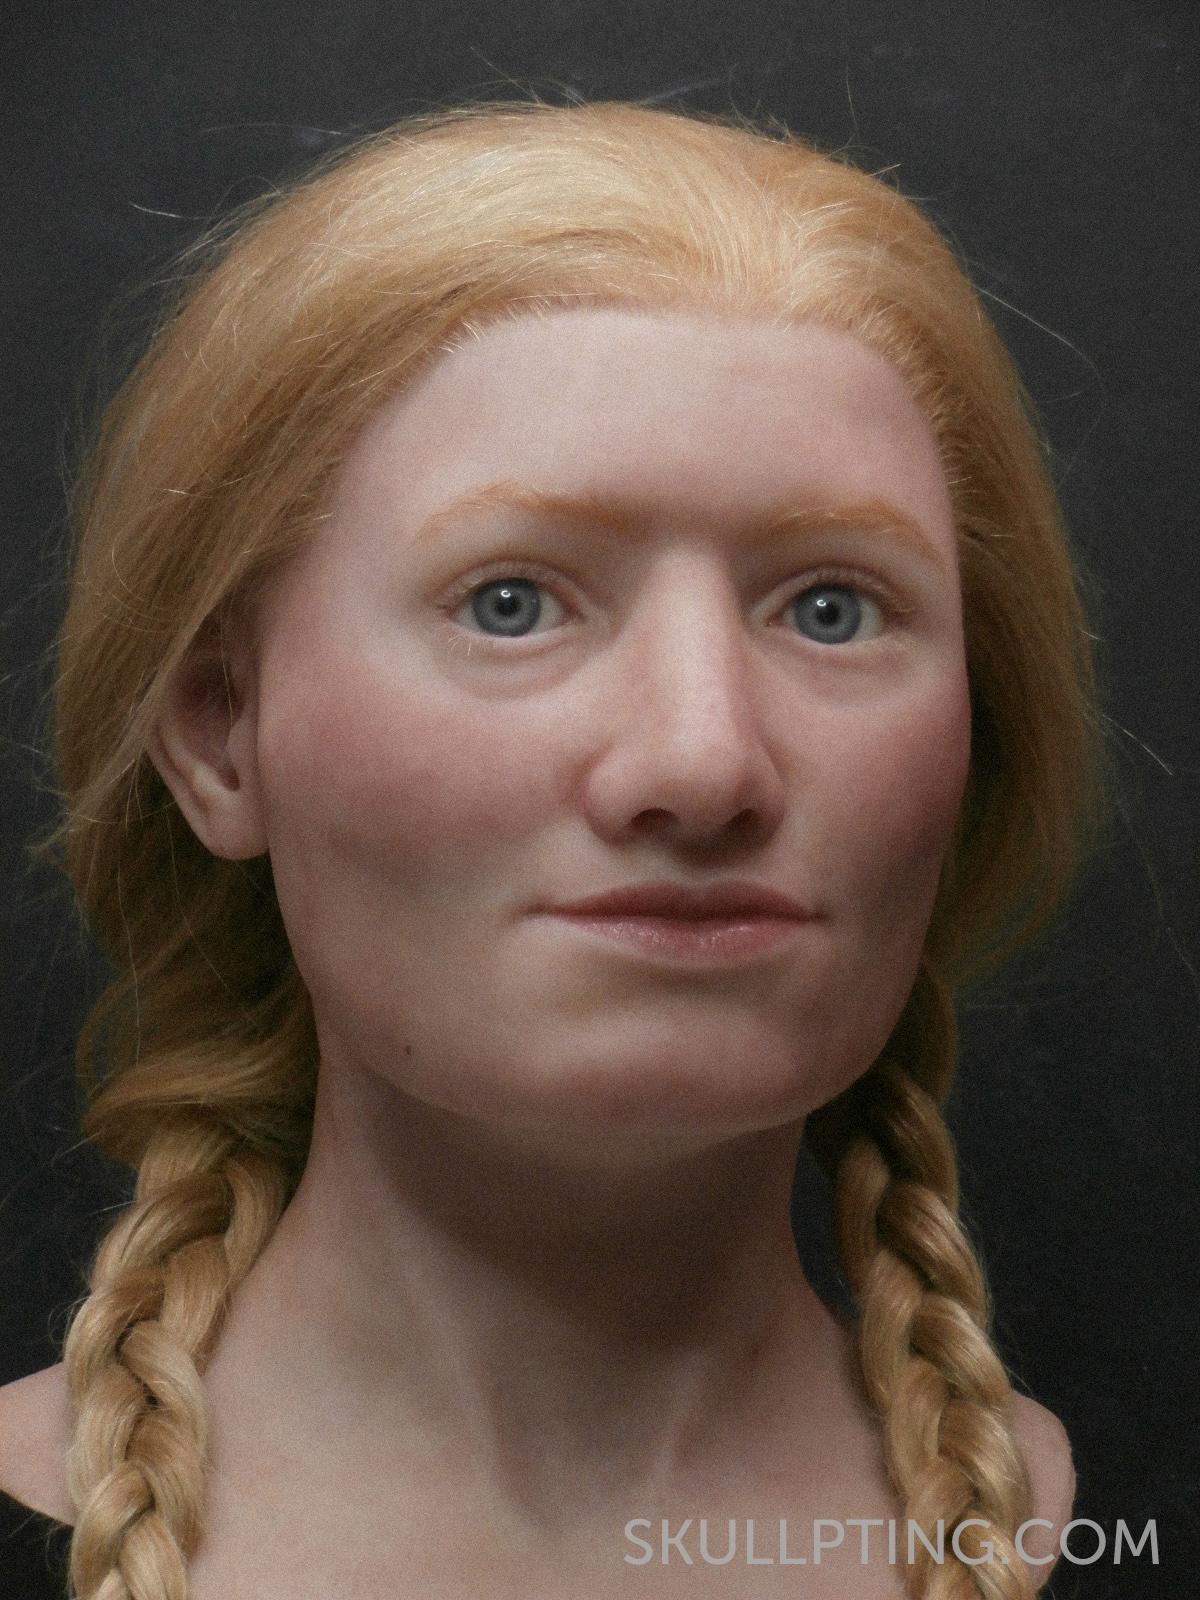 08-bronstijdmeisje (8)b